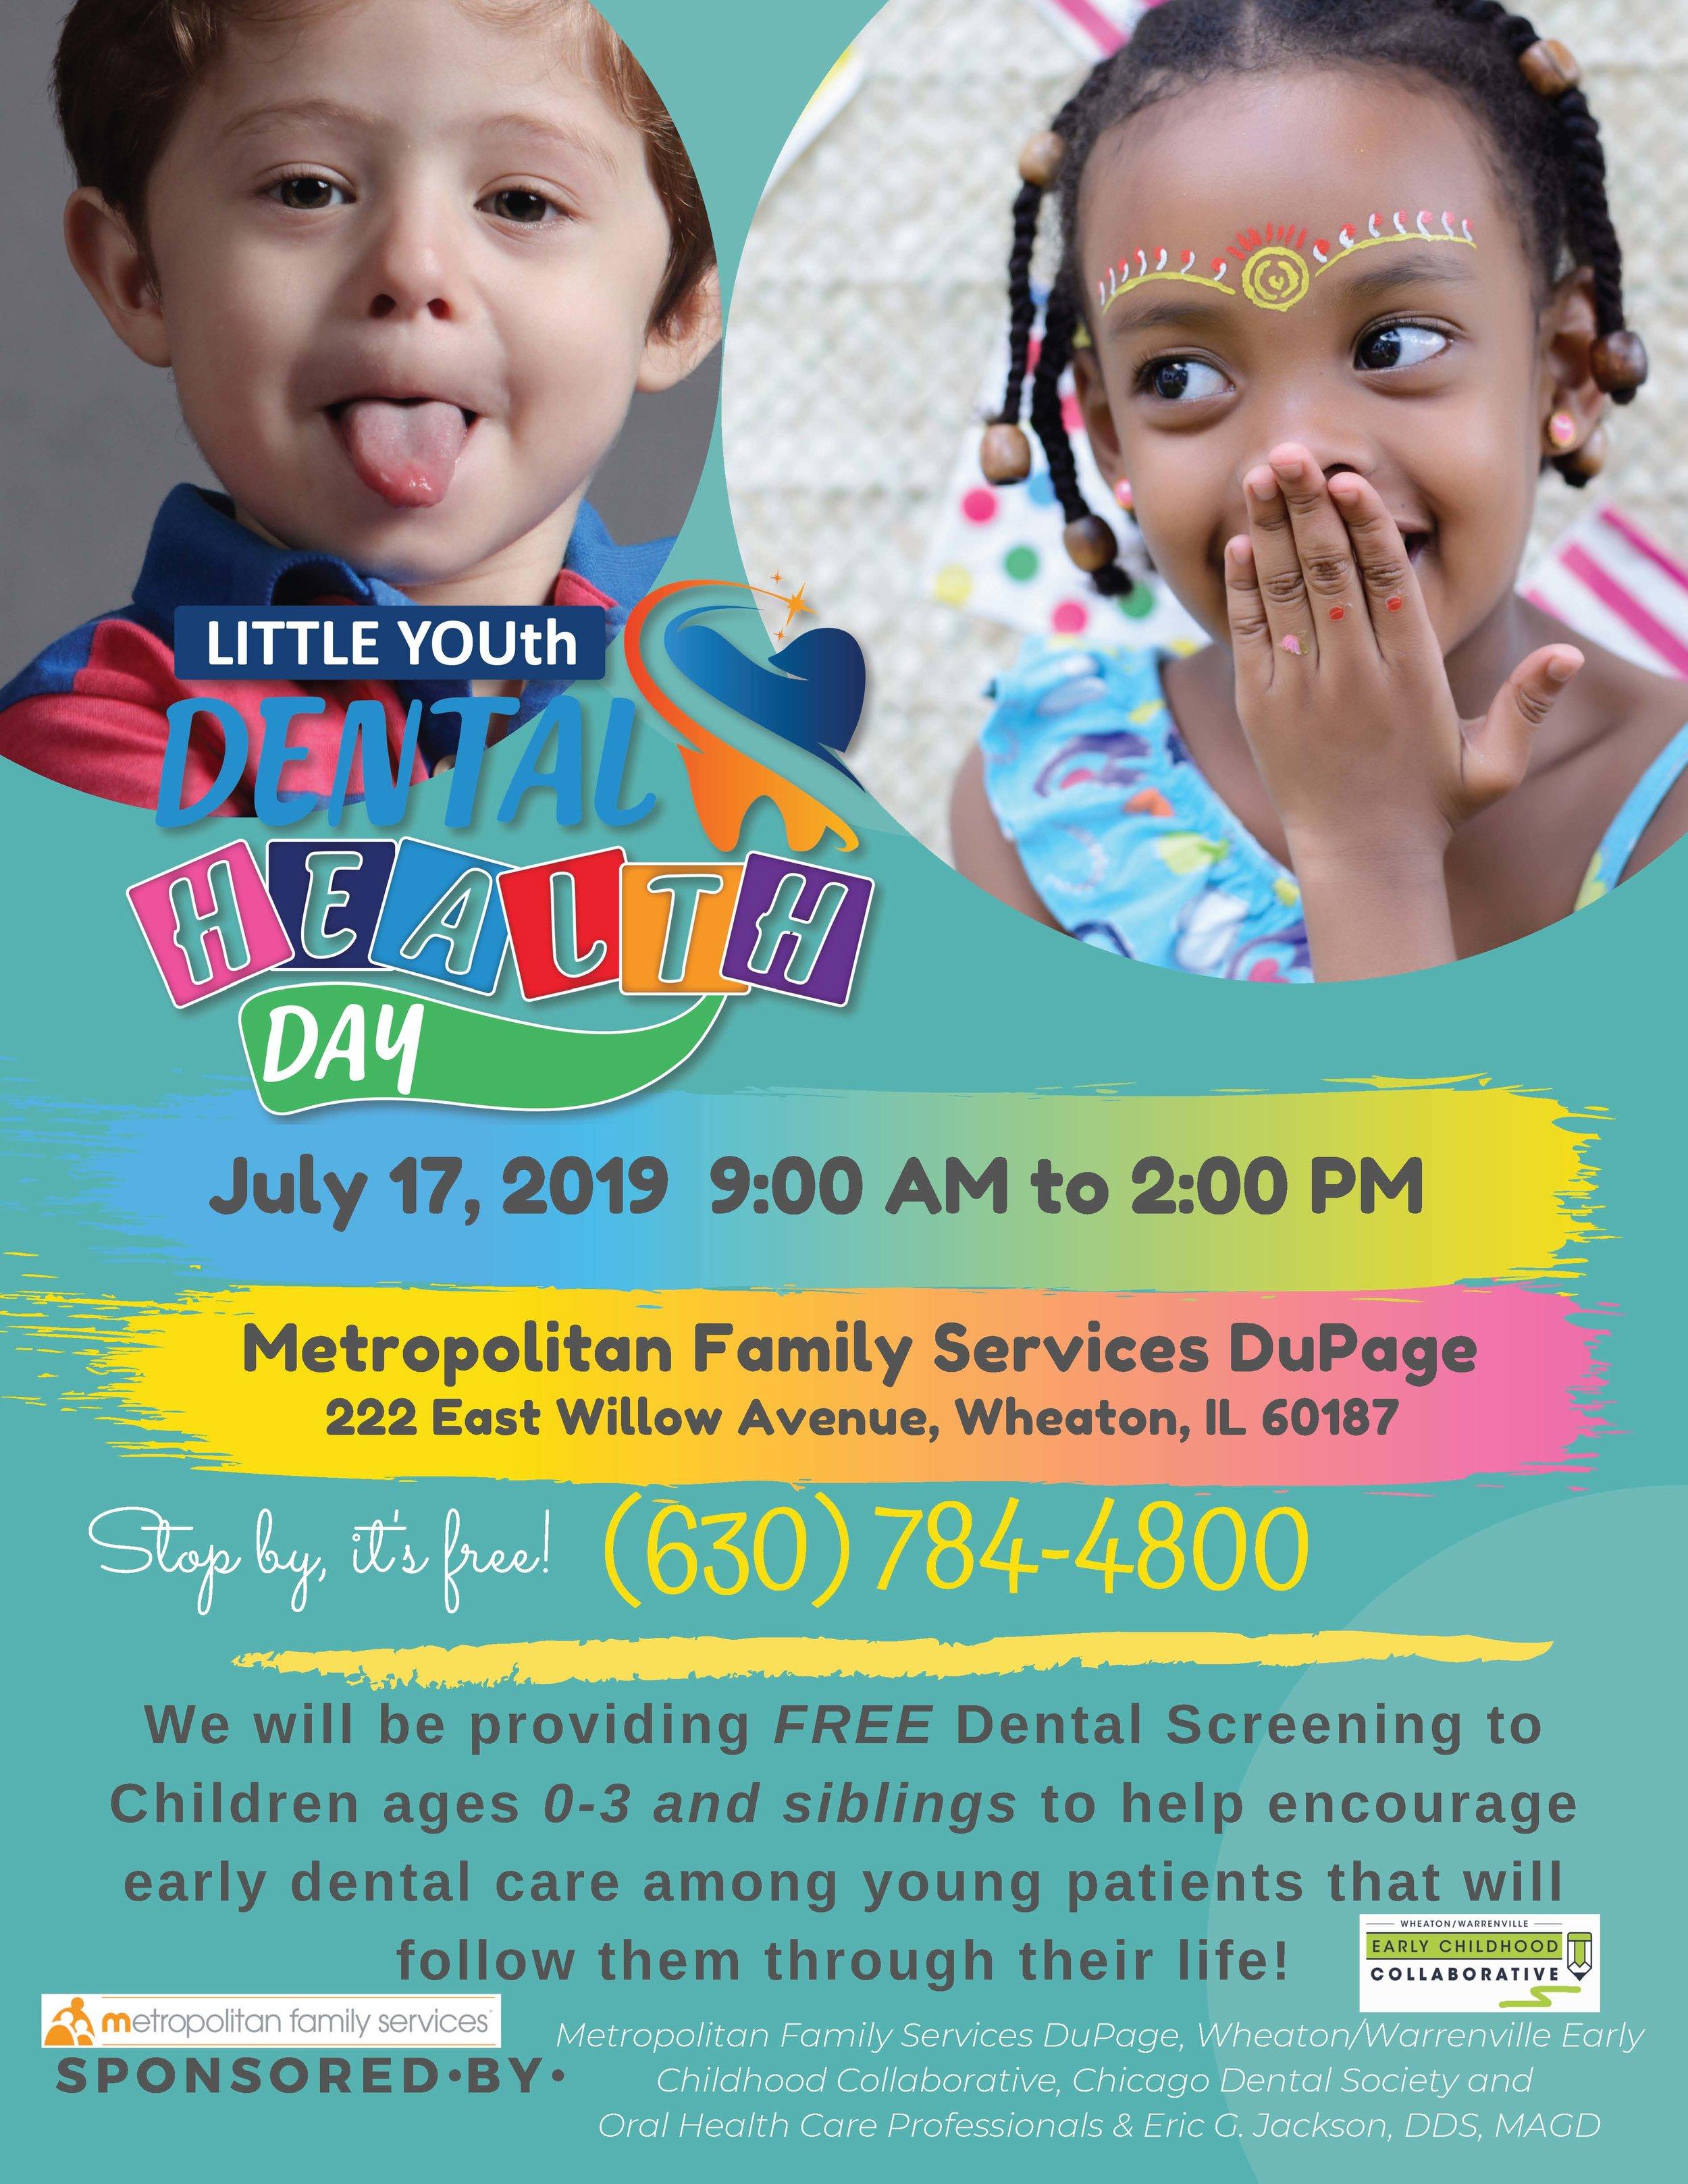 Little YOUth Dental Date 2019 Flyer - English.jpg